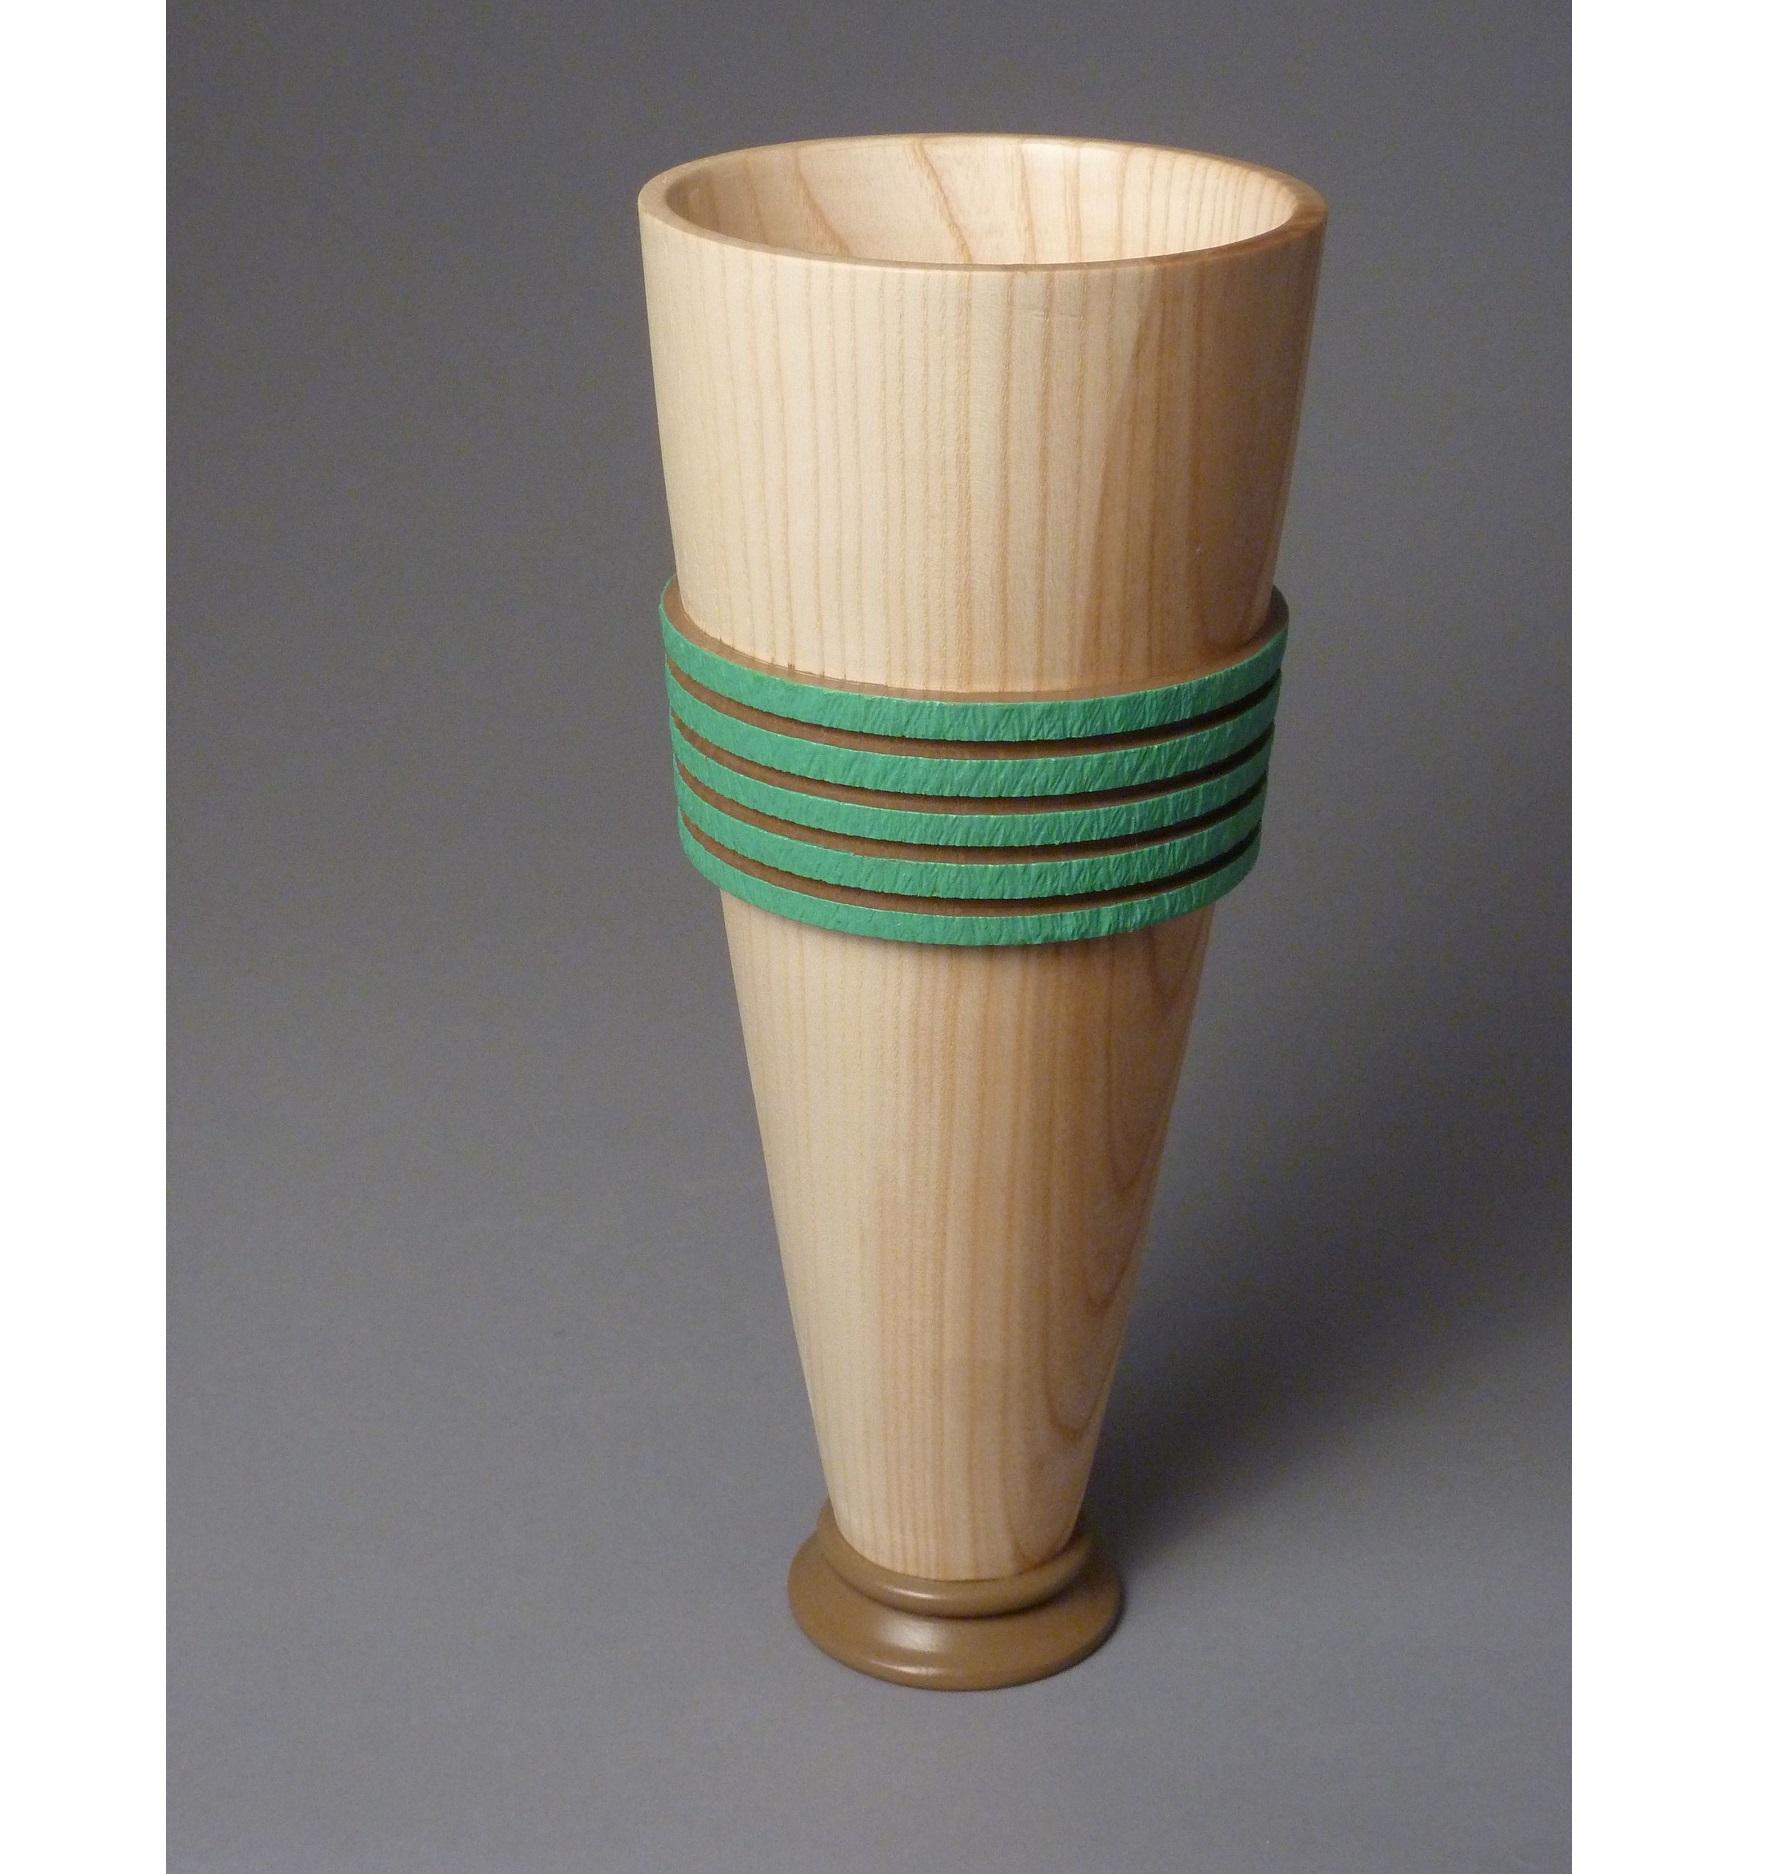 "Banded Vase  6""D x 15""H; Ash, Paint, Ink $320"